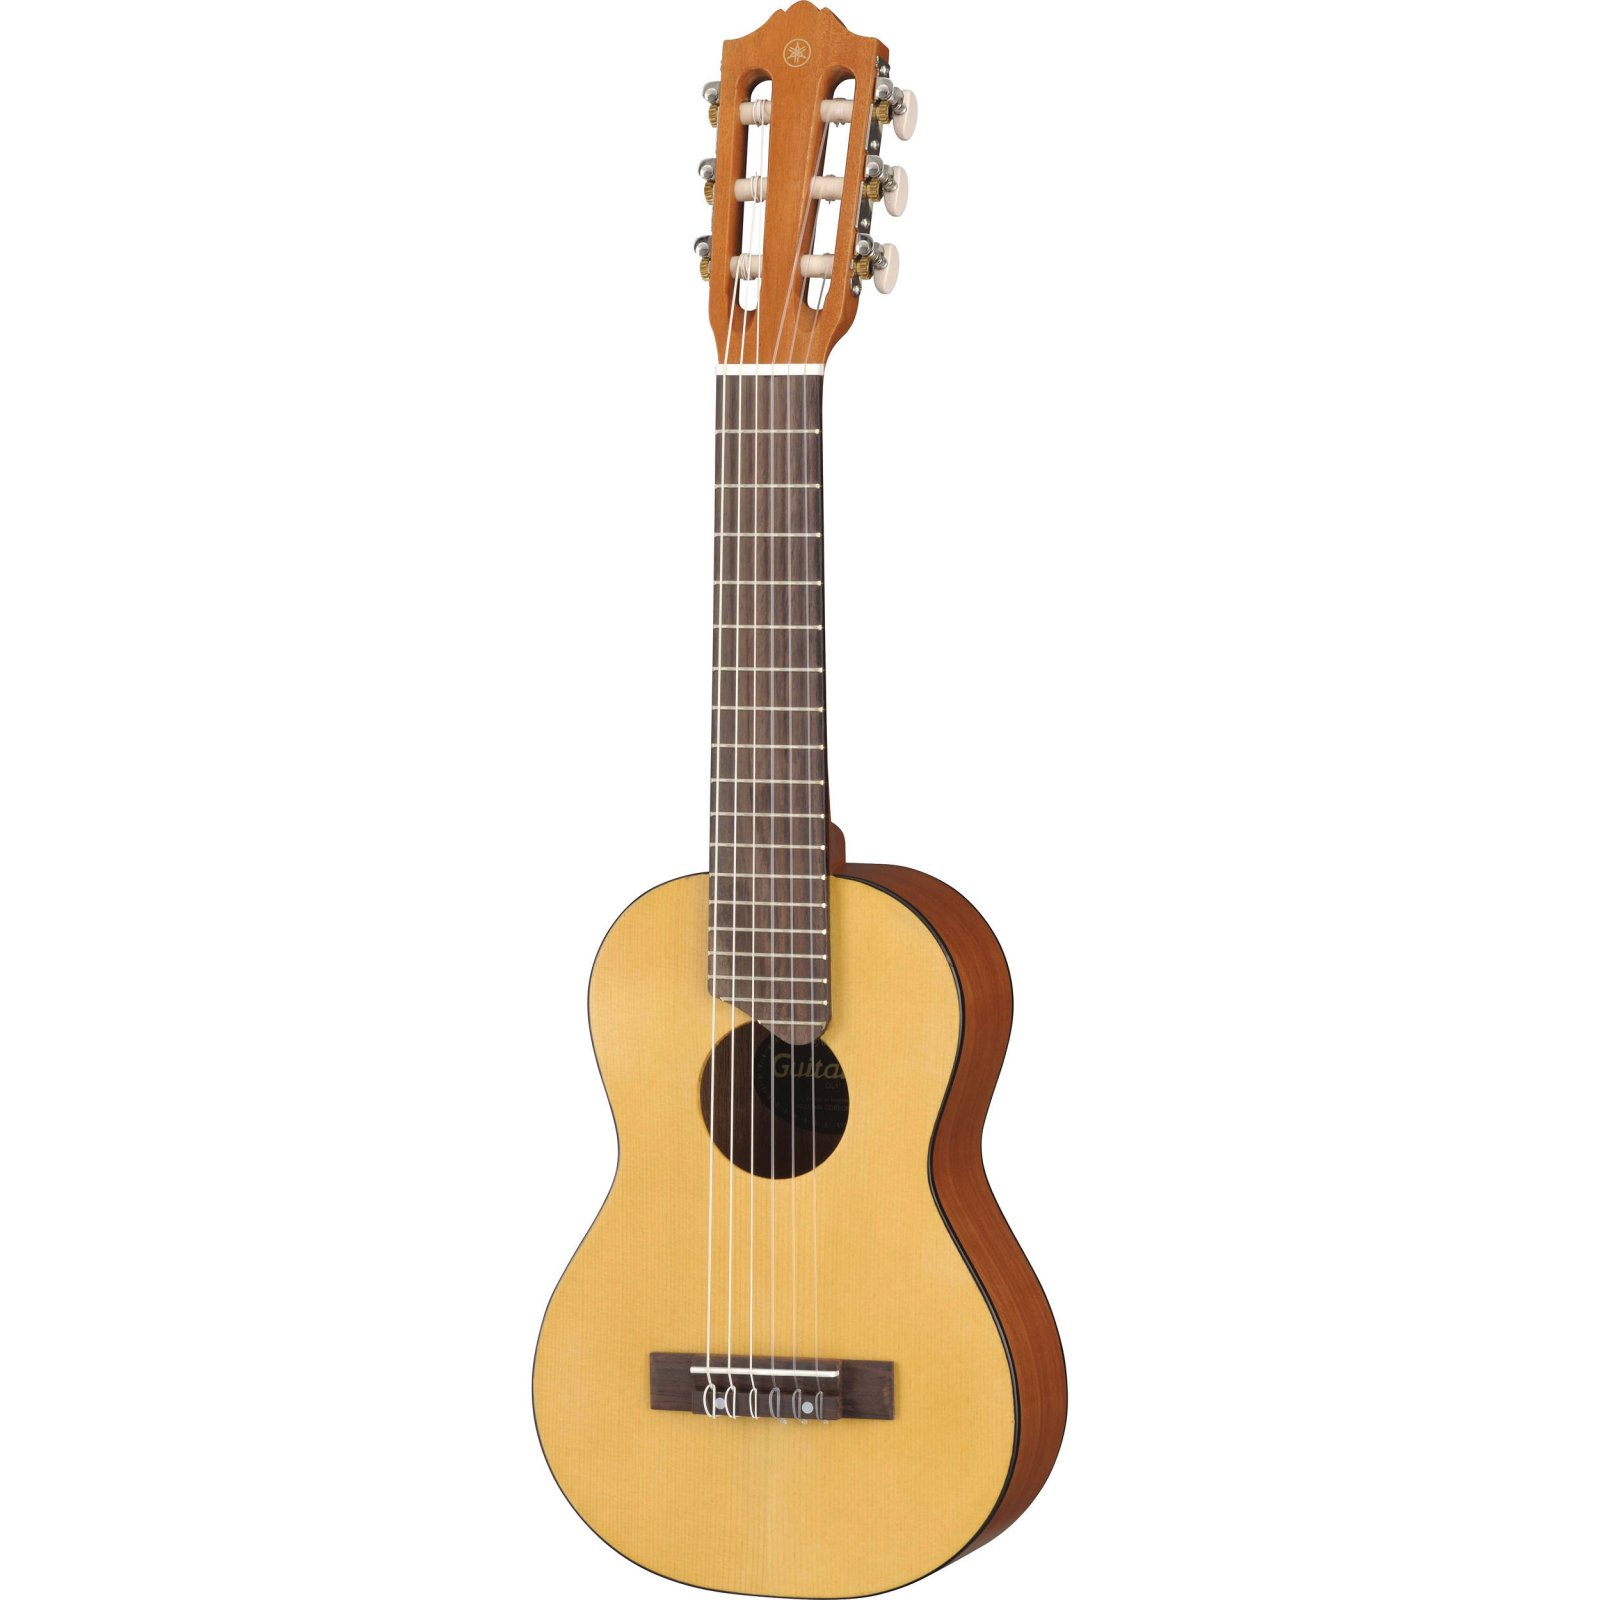 Yamaha GL1 6-String Nylon Guitalele - Natural